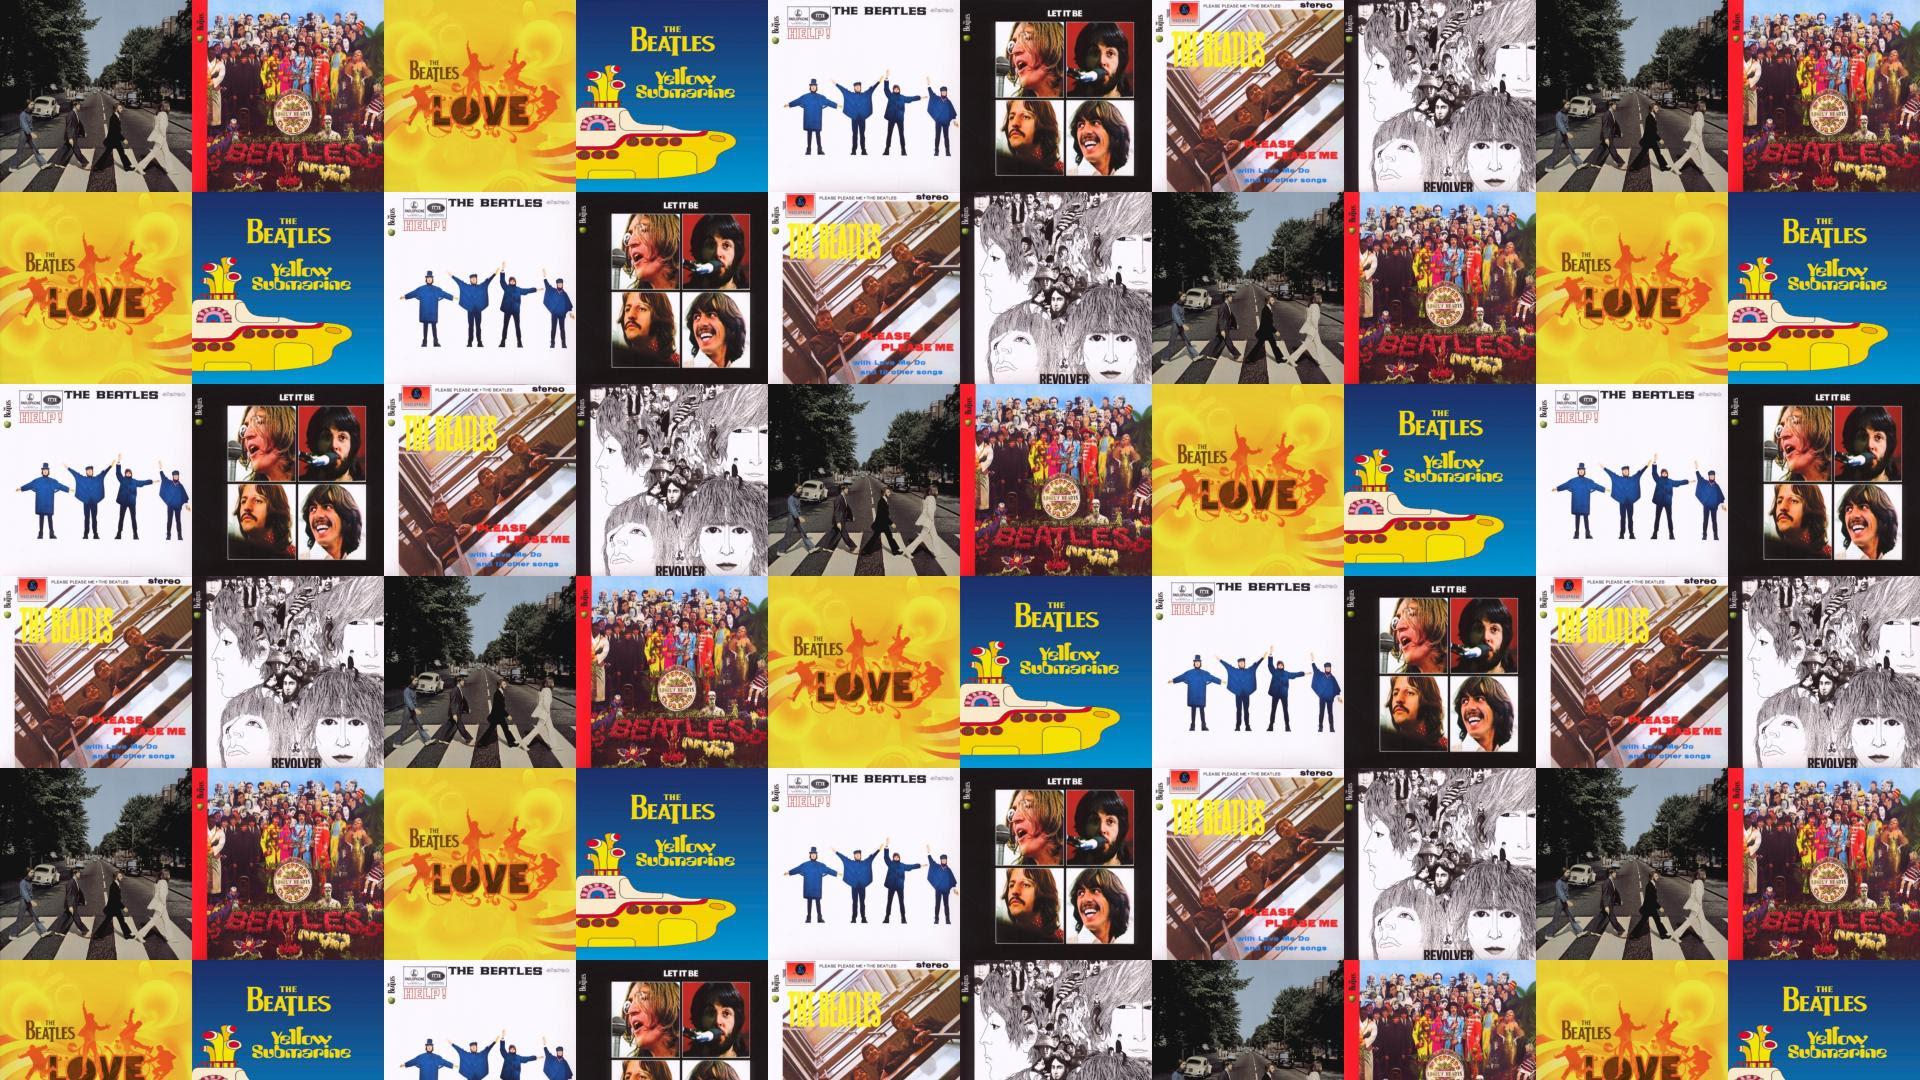 Beatles Abbey Road Sergent Pepper Beatles Love Wallpaper Tiled